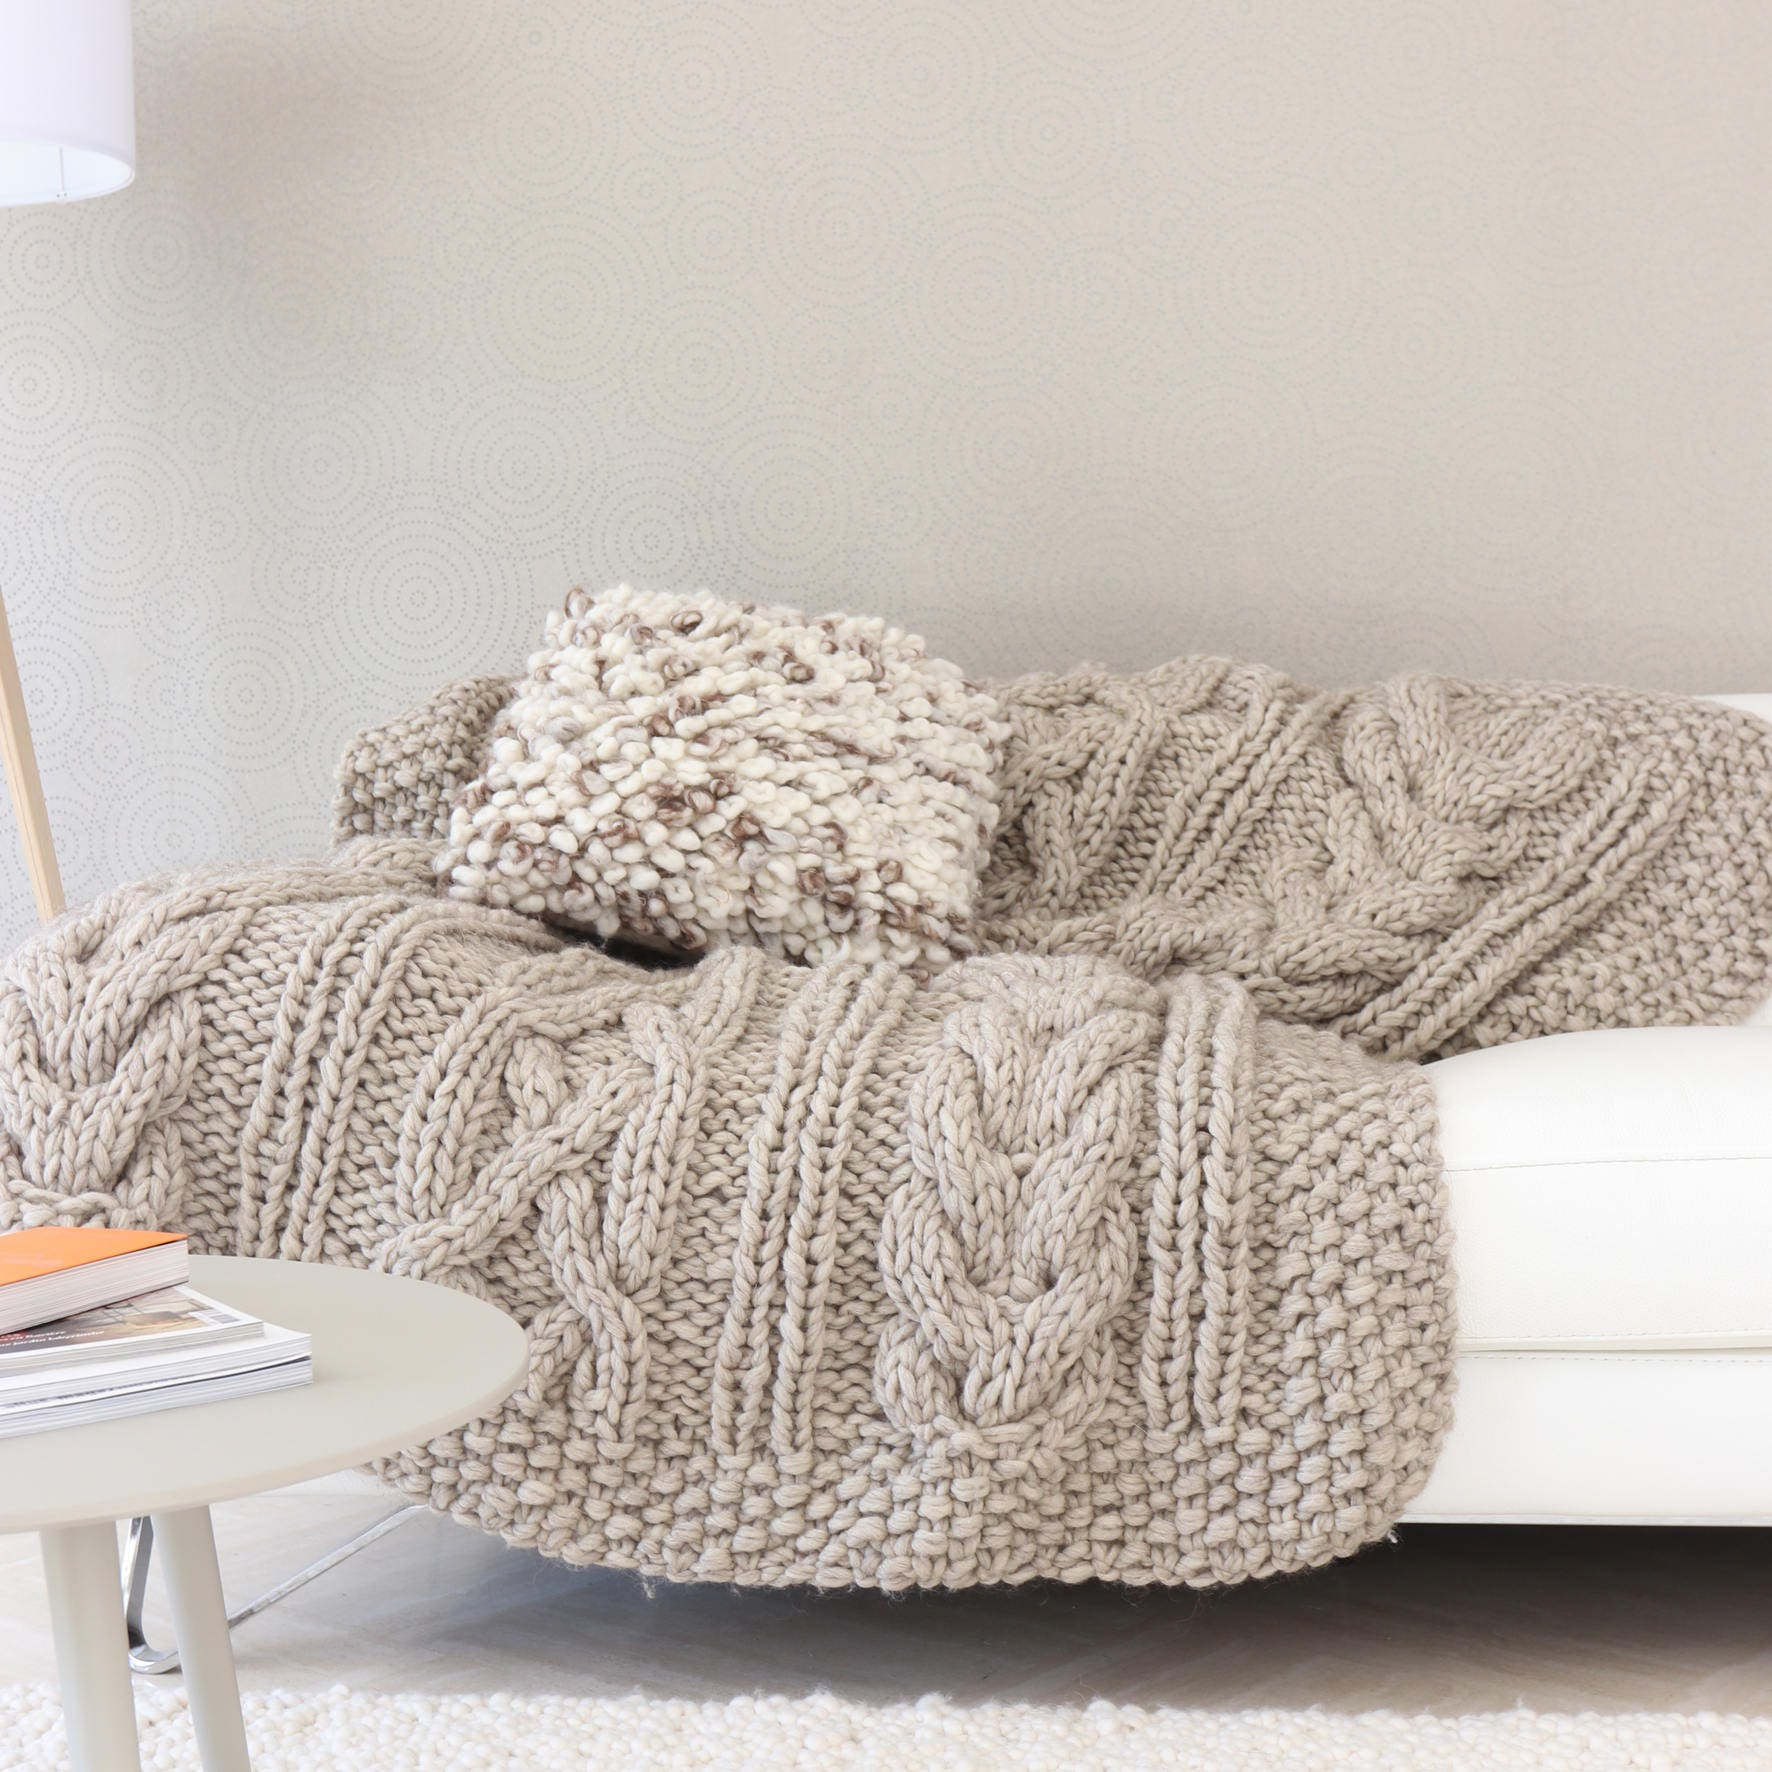 ripple afghans blanket plaid big chunky yarn super bulky. Black Bedroom Furniture Sets. Home Design Ideas